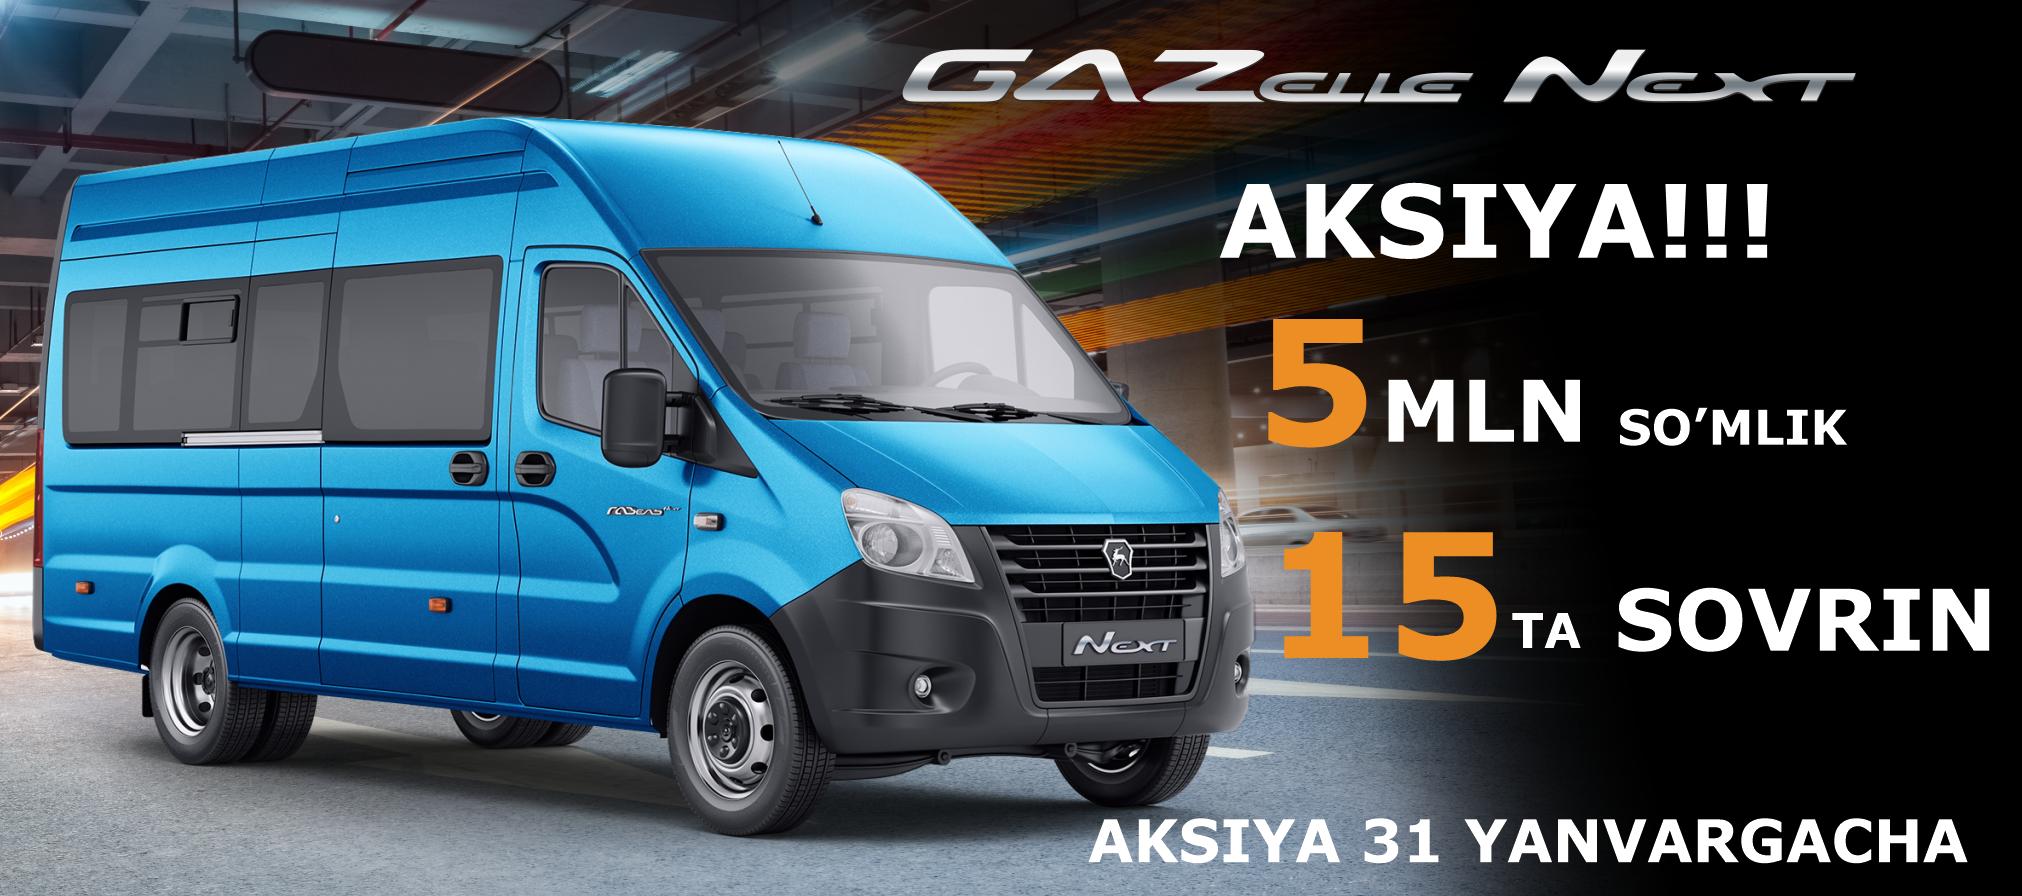 GAZelle Next mikroavtobuslarini sotib olishda aksiya